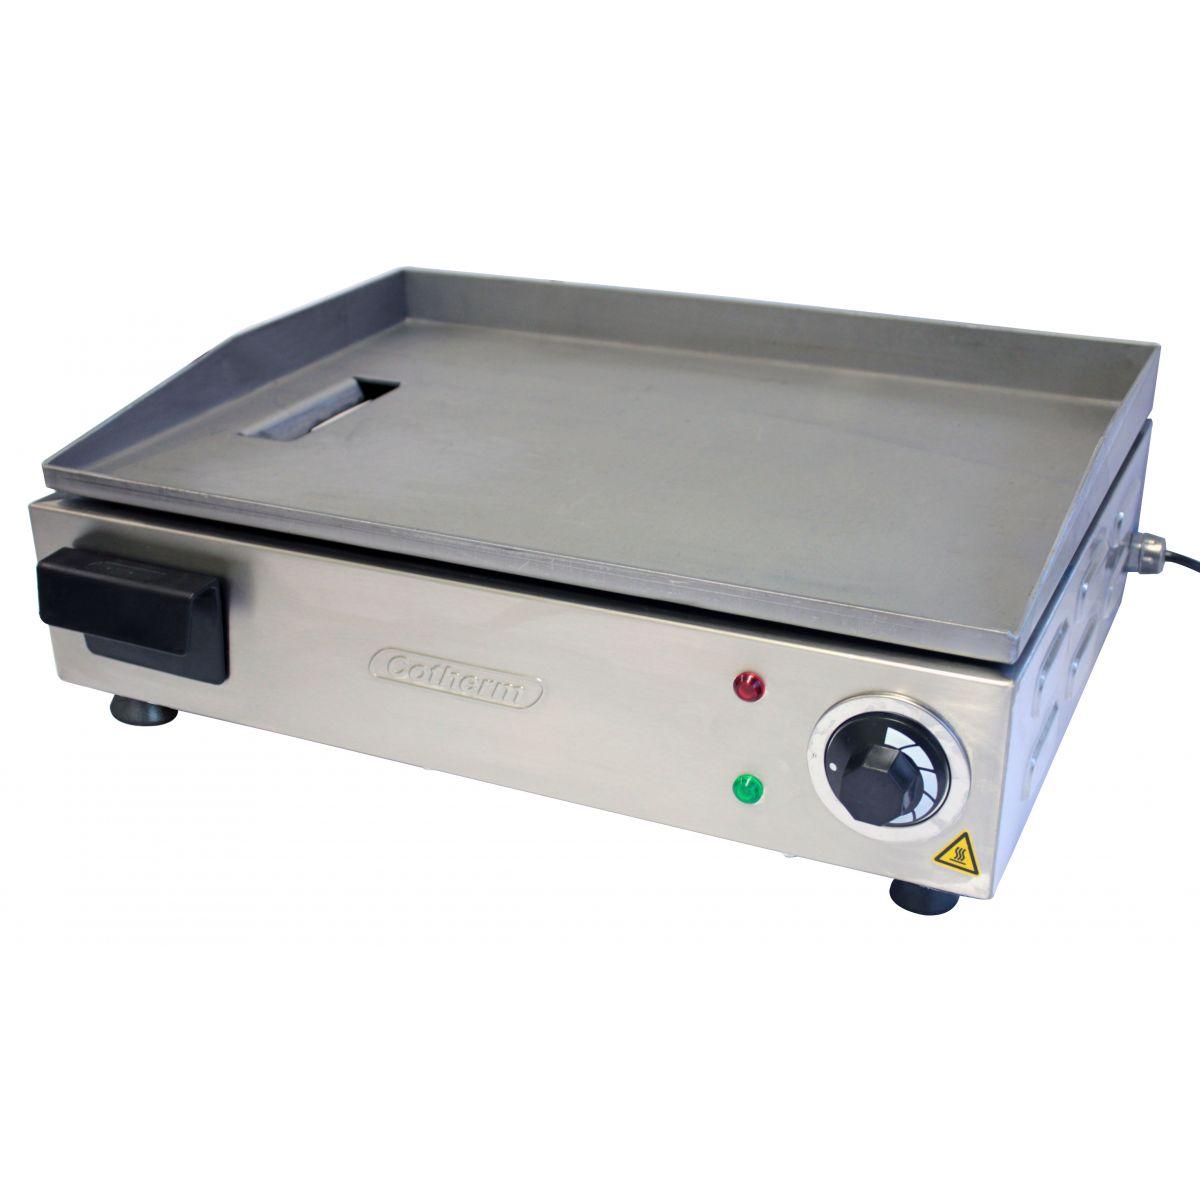 Chapeira para Lanches elétrica Chapa Profissional 50x35cm 1600W Cotherm  - Mix Eletro